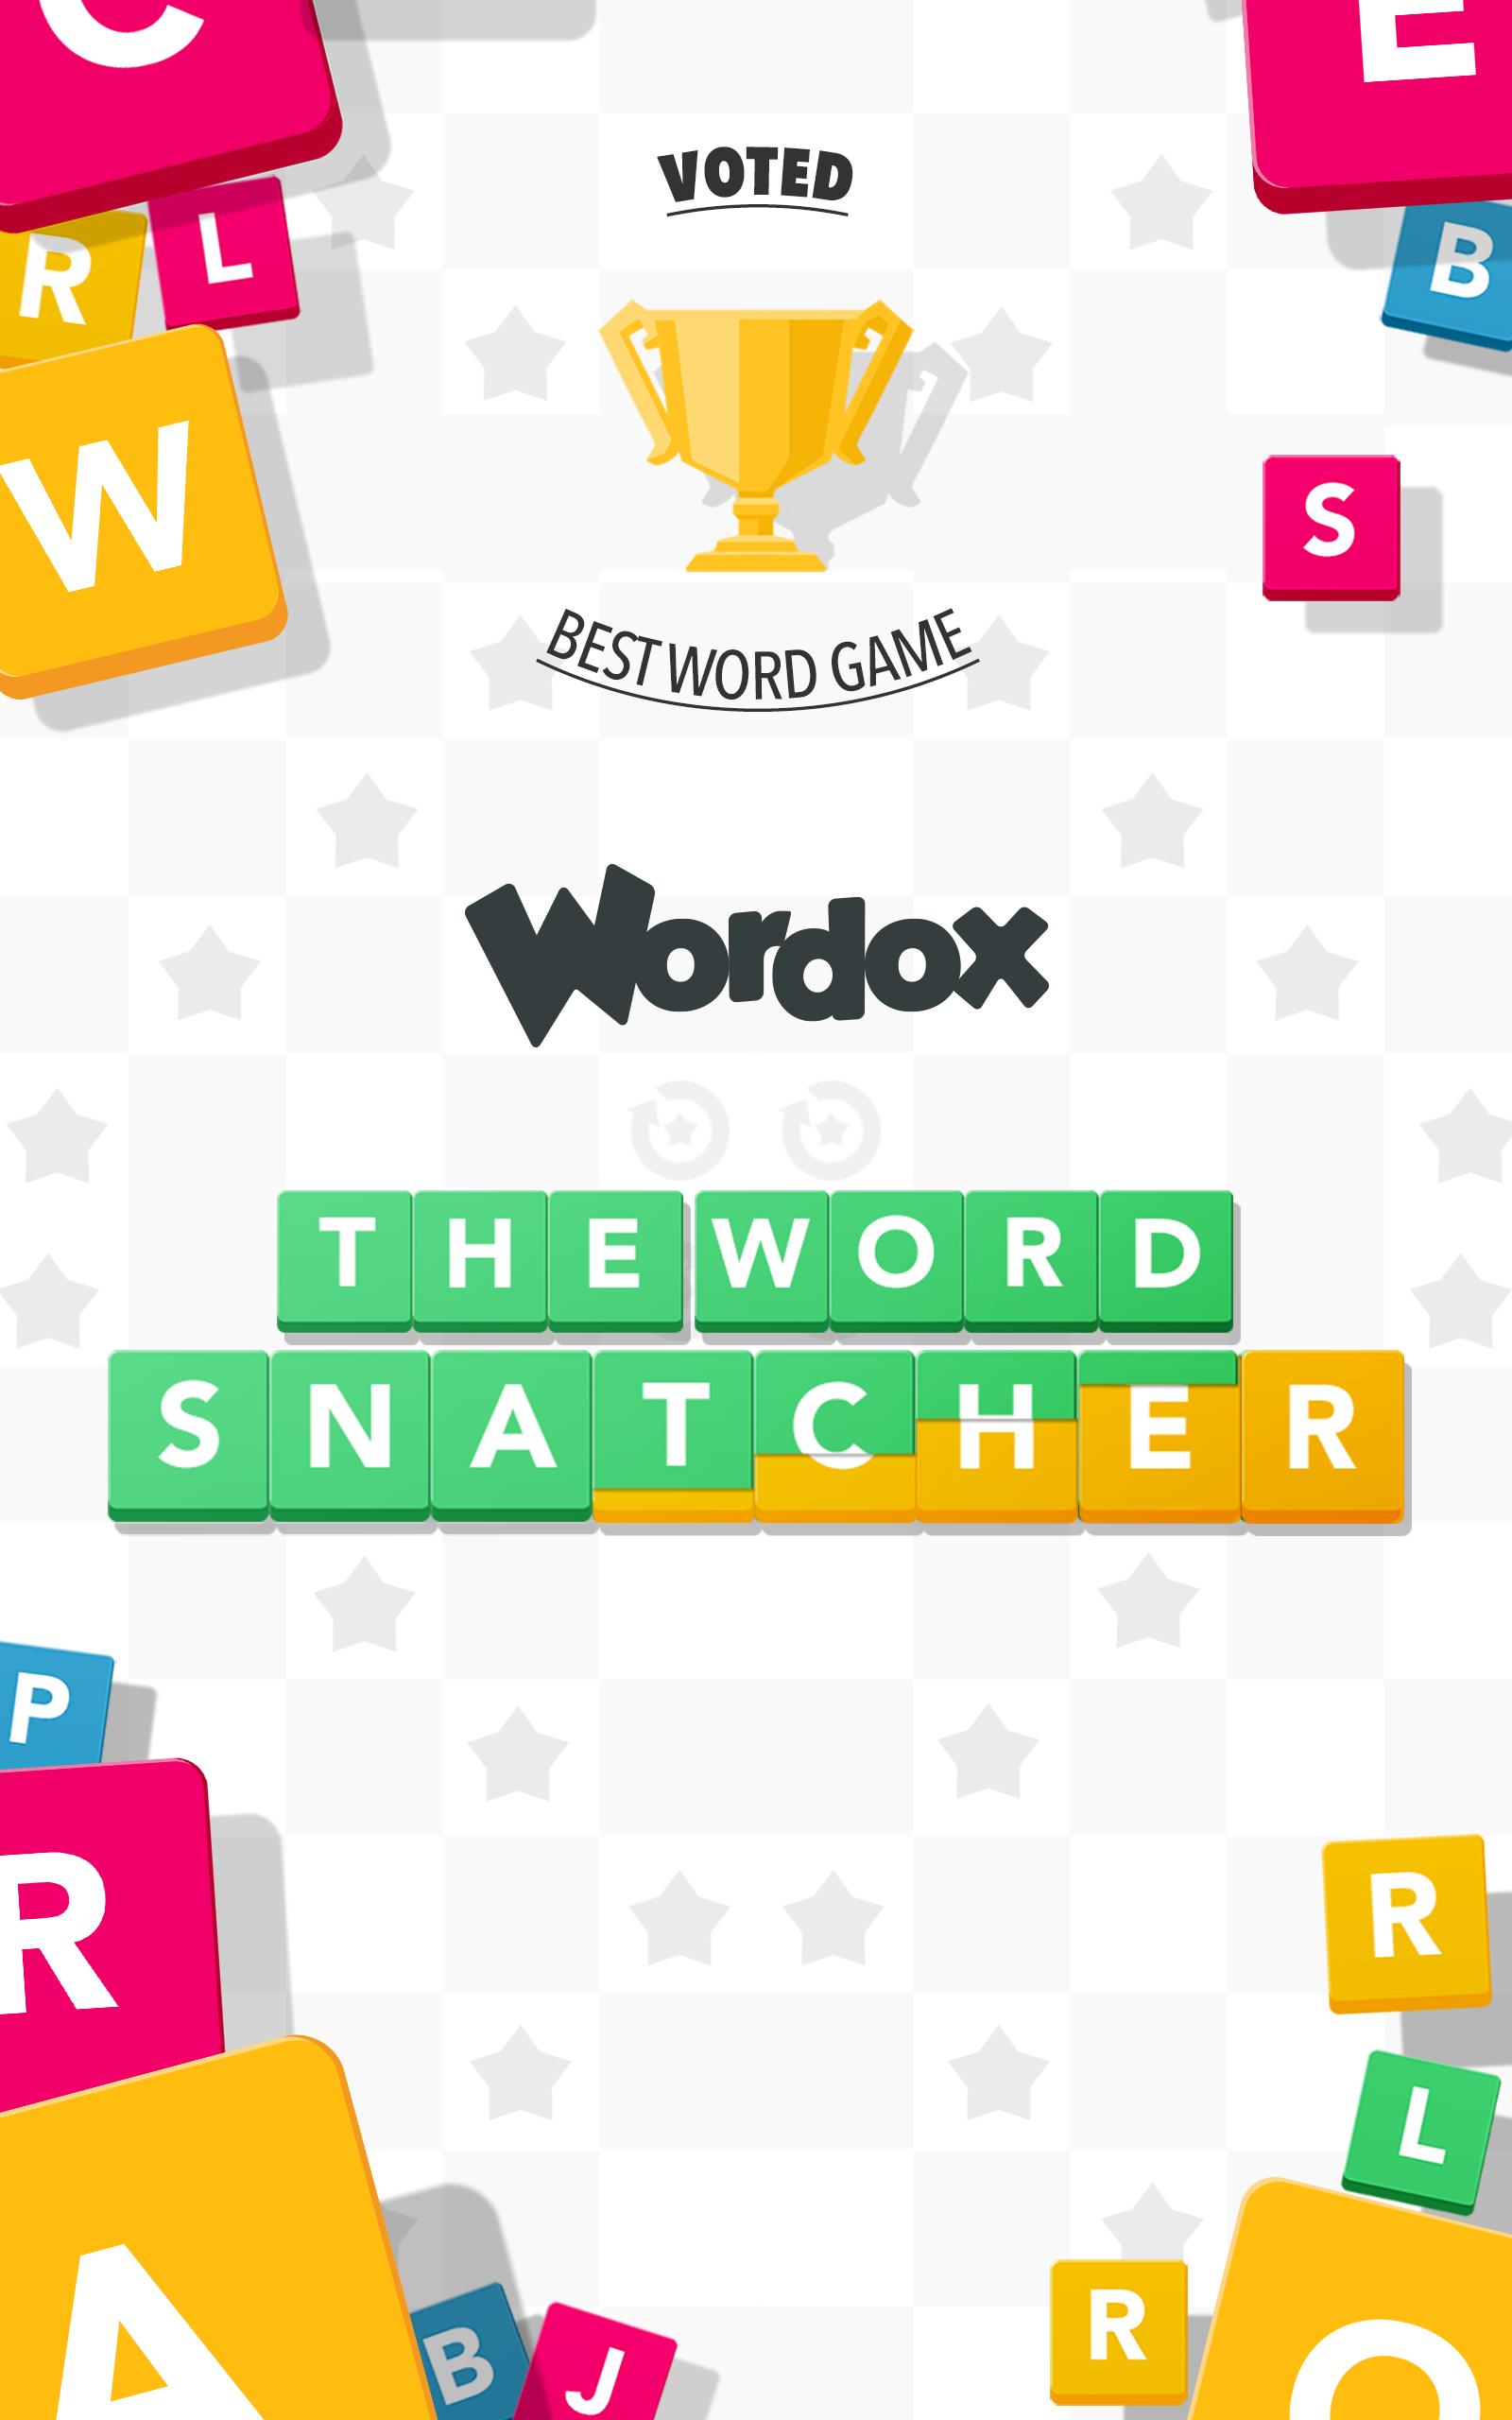 Wordox The Word Snatcher screenshot #1